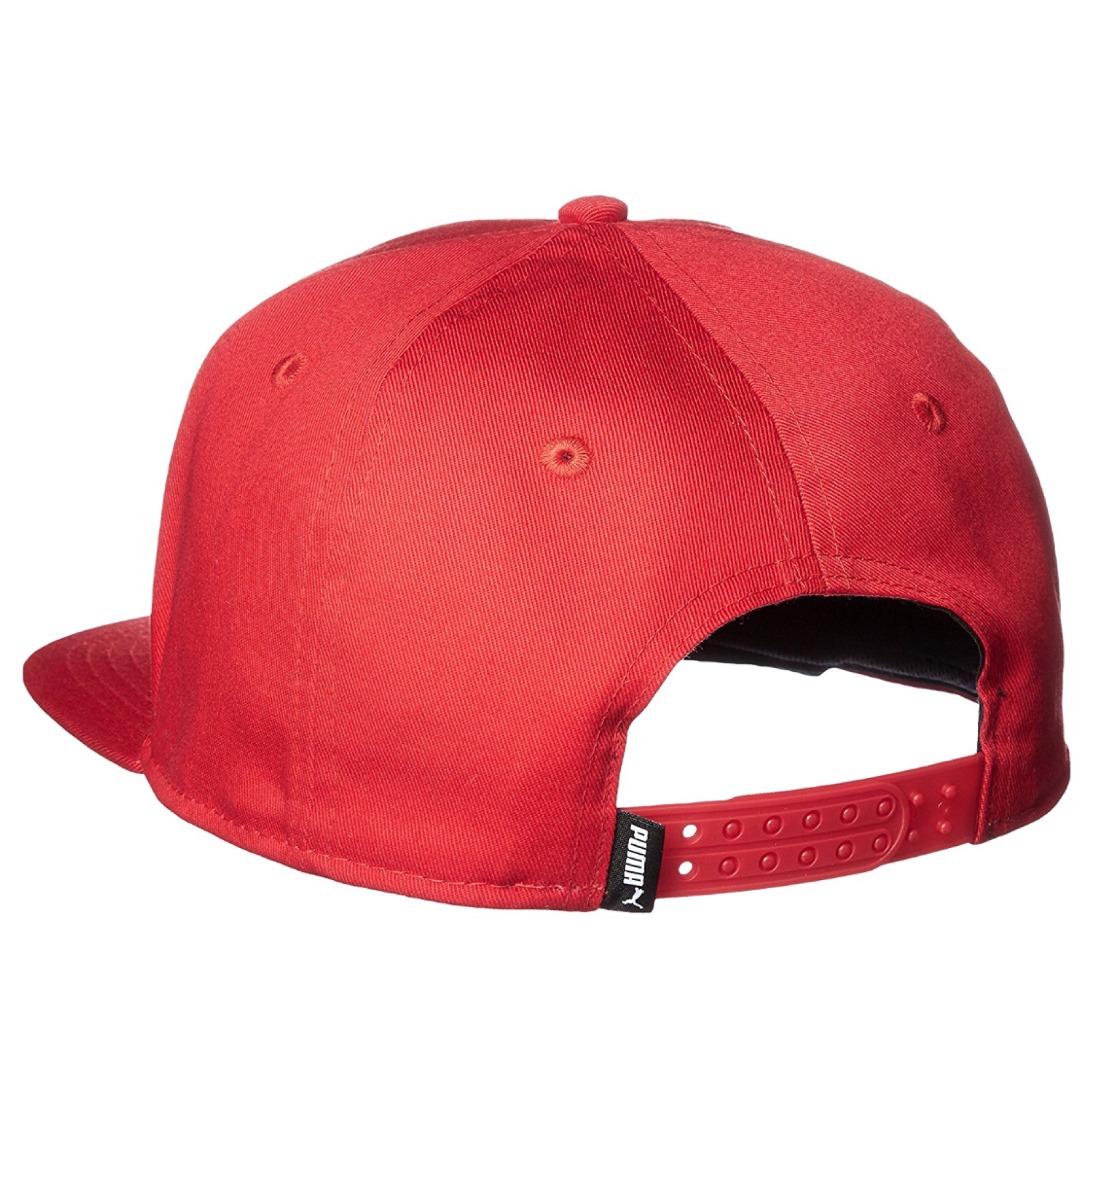 gorra puma para hombre unitalla color rojo. Cargando zoom... gorra puma  hombre. Cargando zoom. 6bc901be1e7